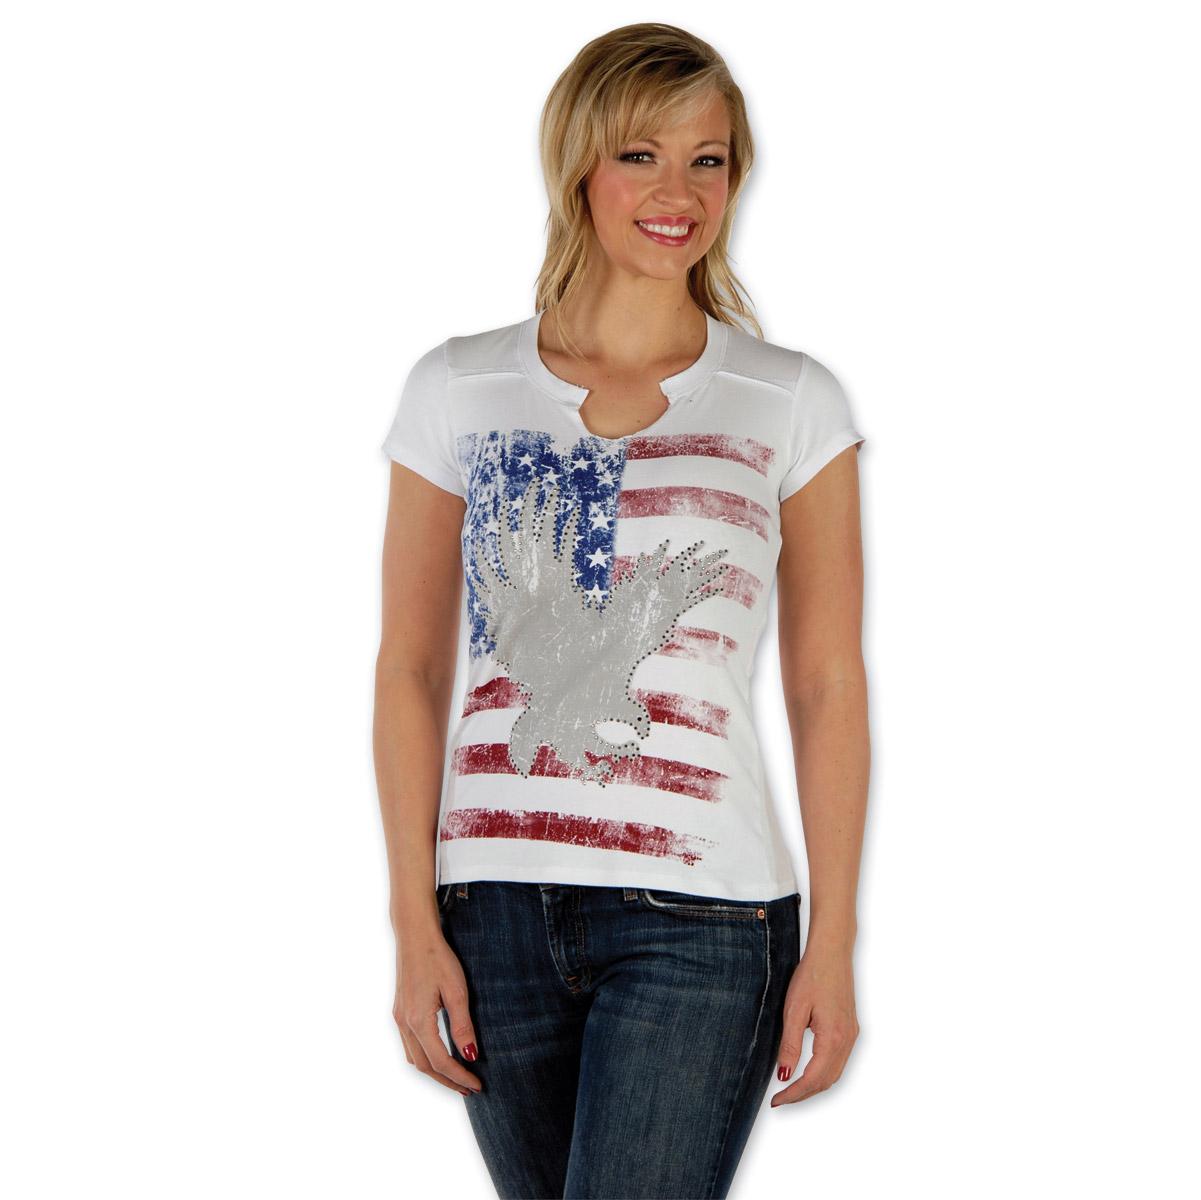 Liberty Wear Eagle Flag Embellished Ladies White T-shirt